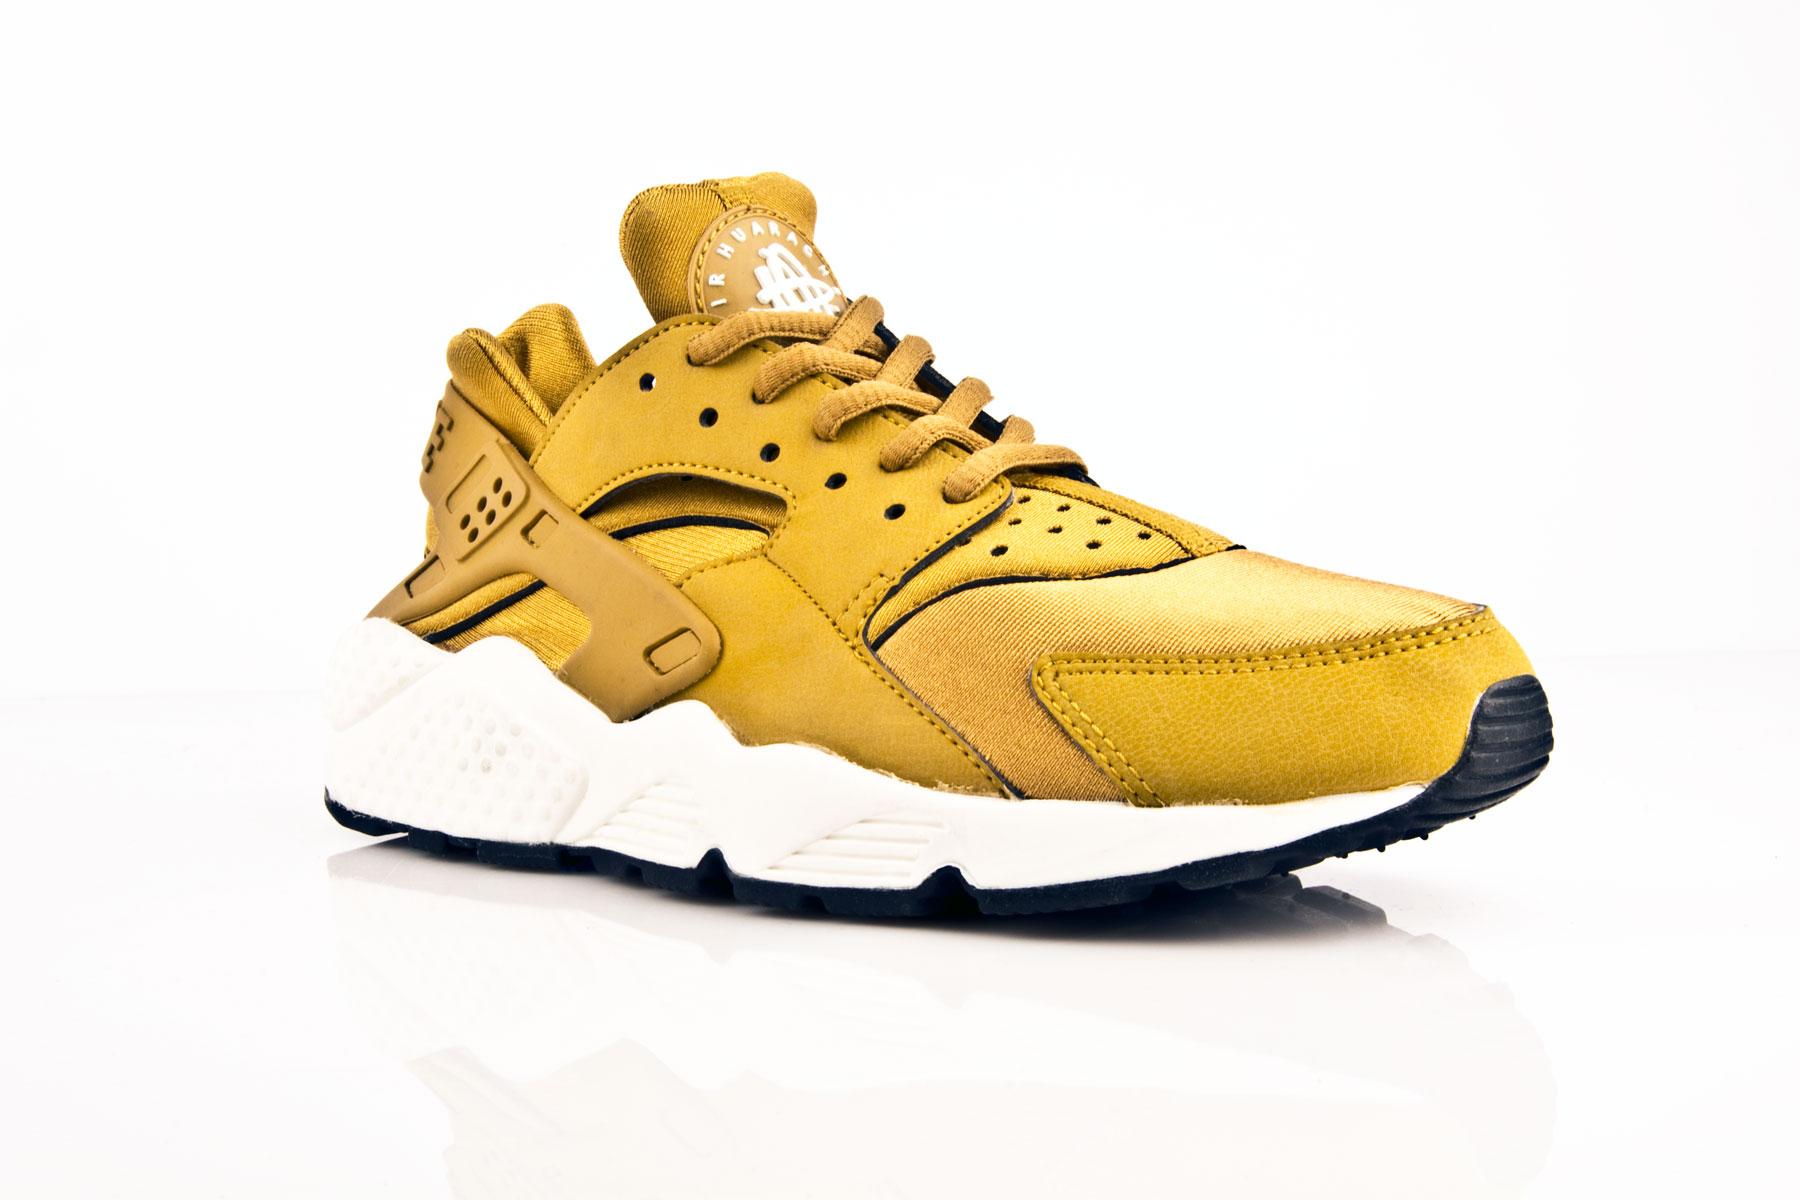 air huarache in gold \u003e Clearance shop